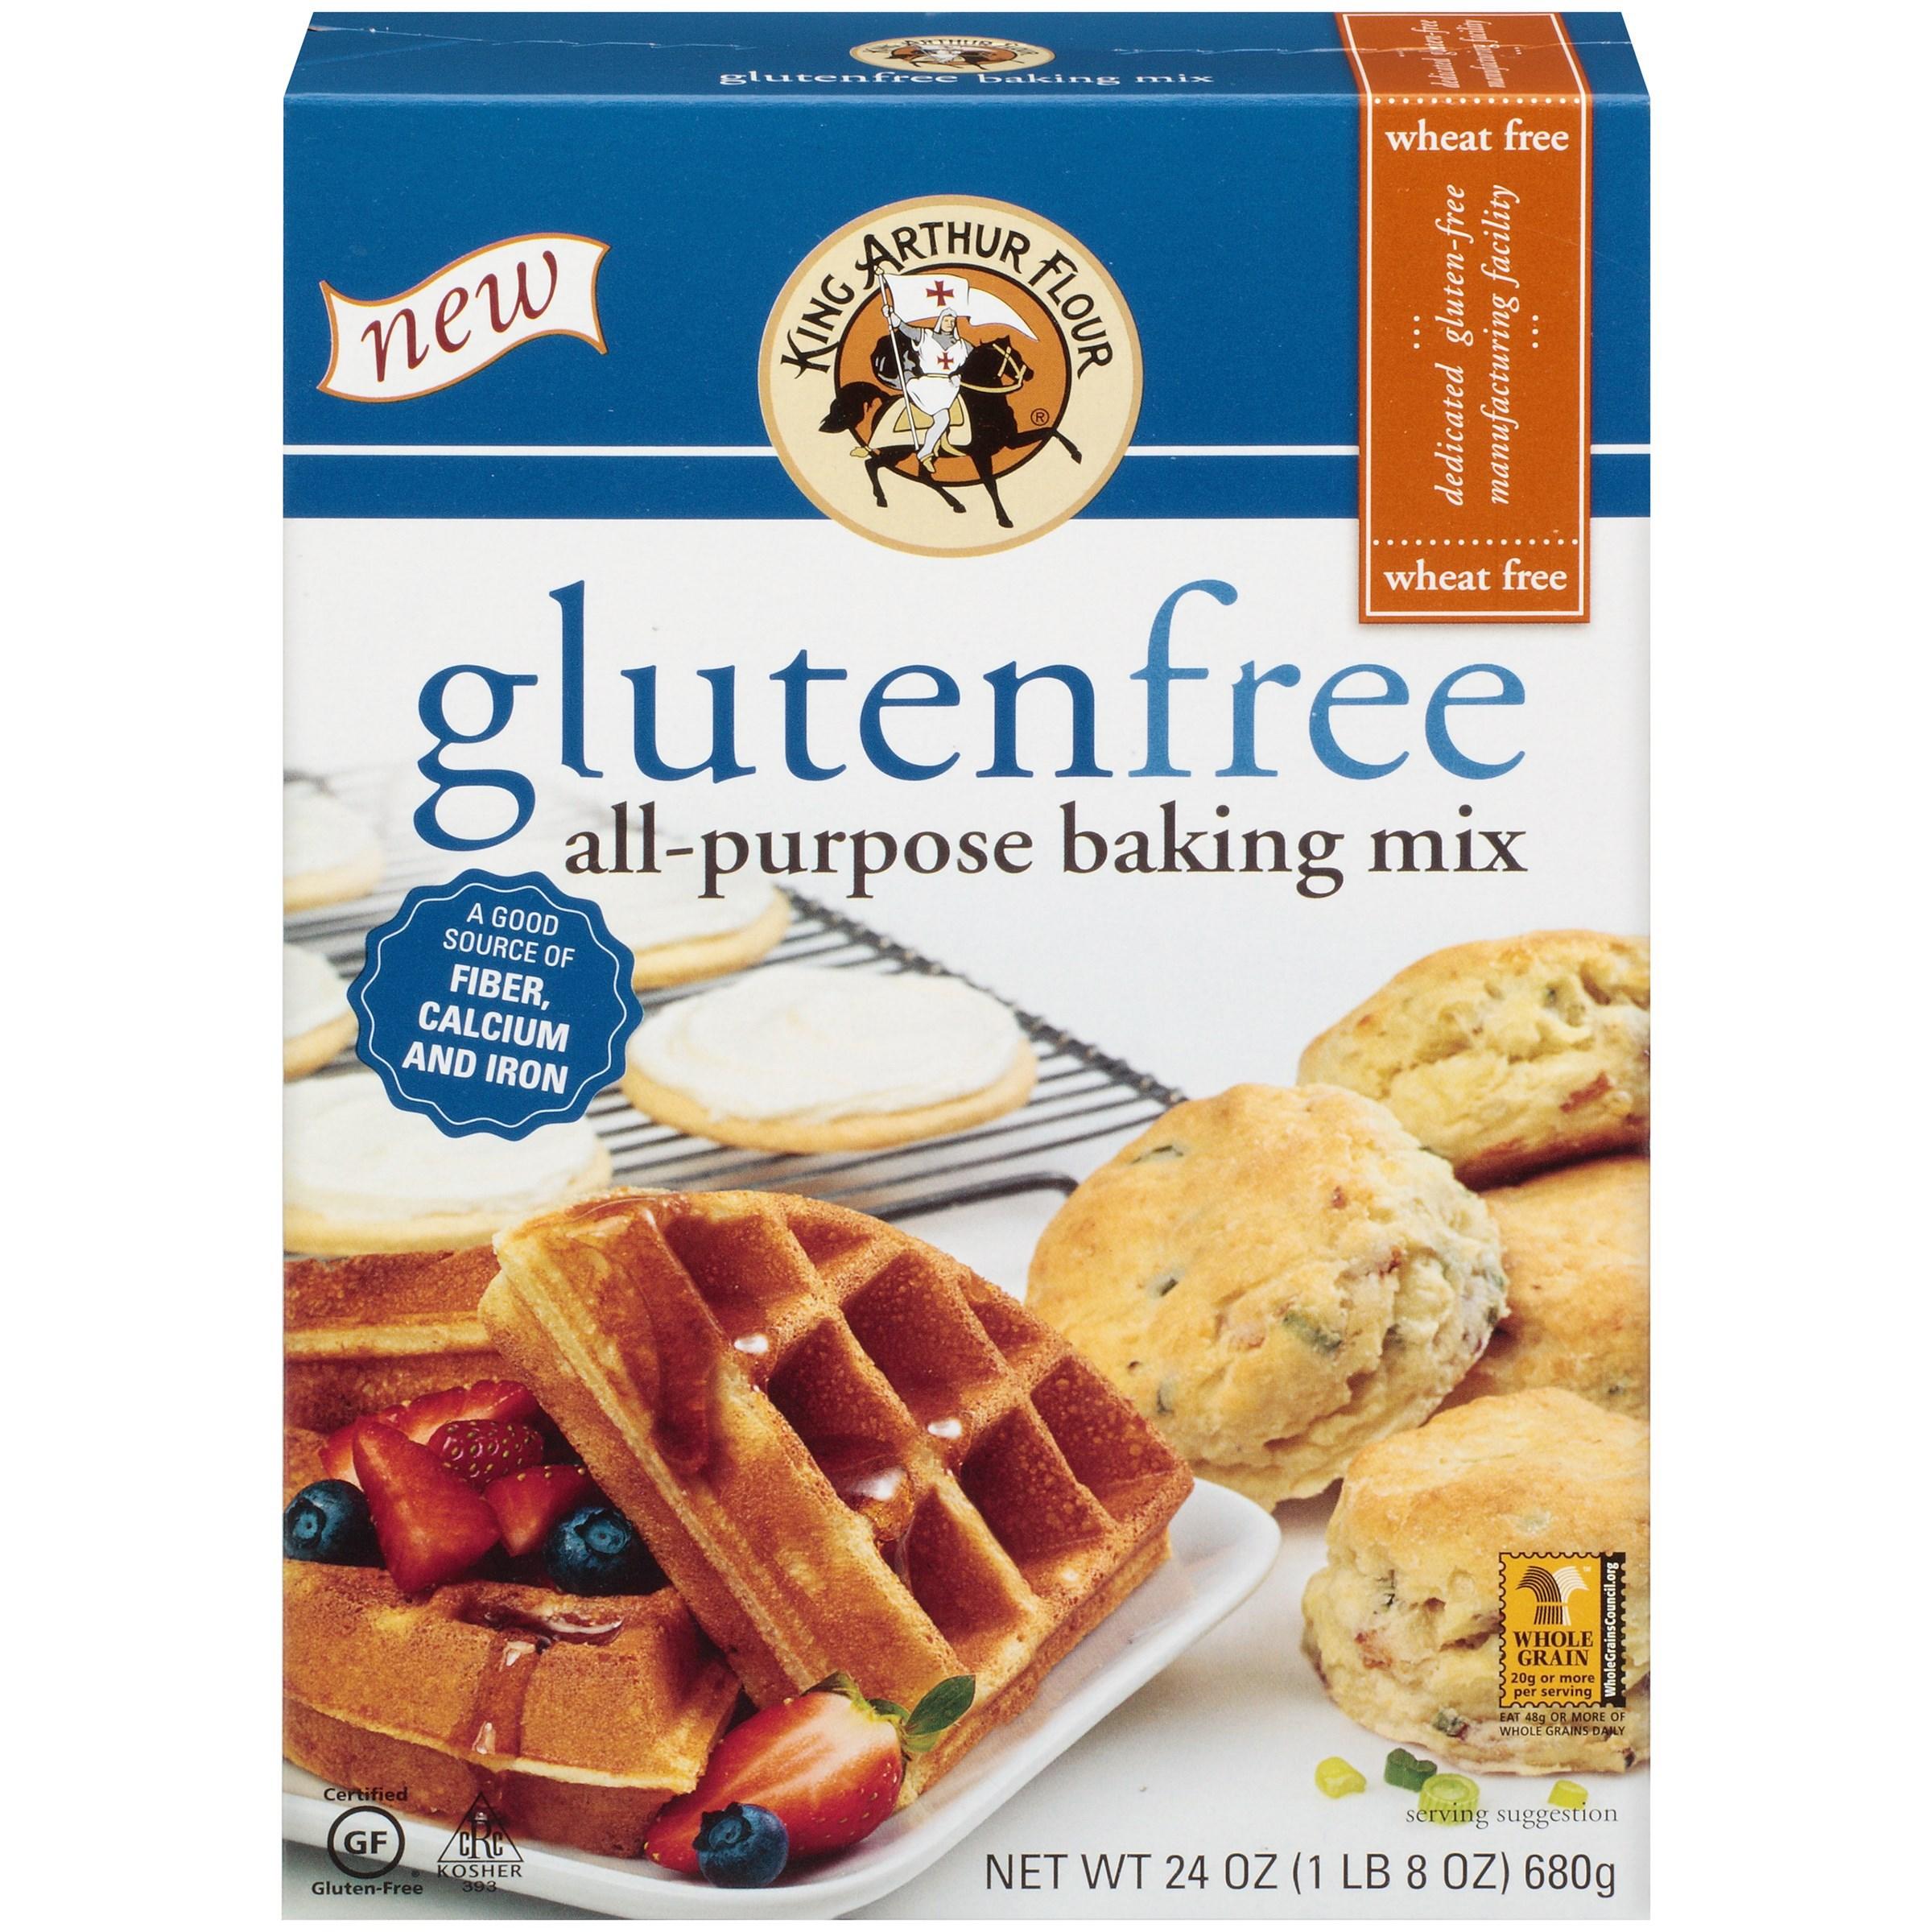 King Arthur Flour Gluten Free All-Purpose Baking Mix, 24 OZ (Pack of 6)